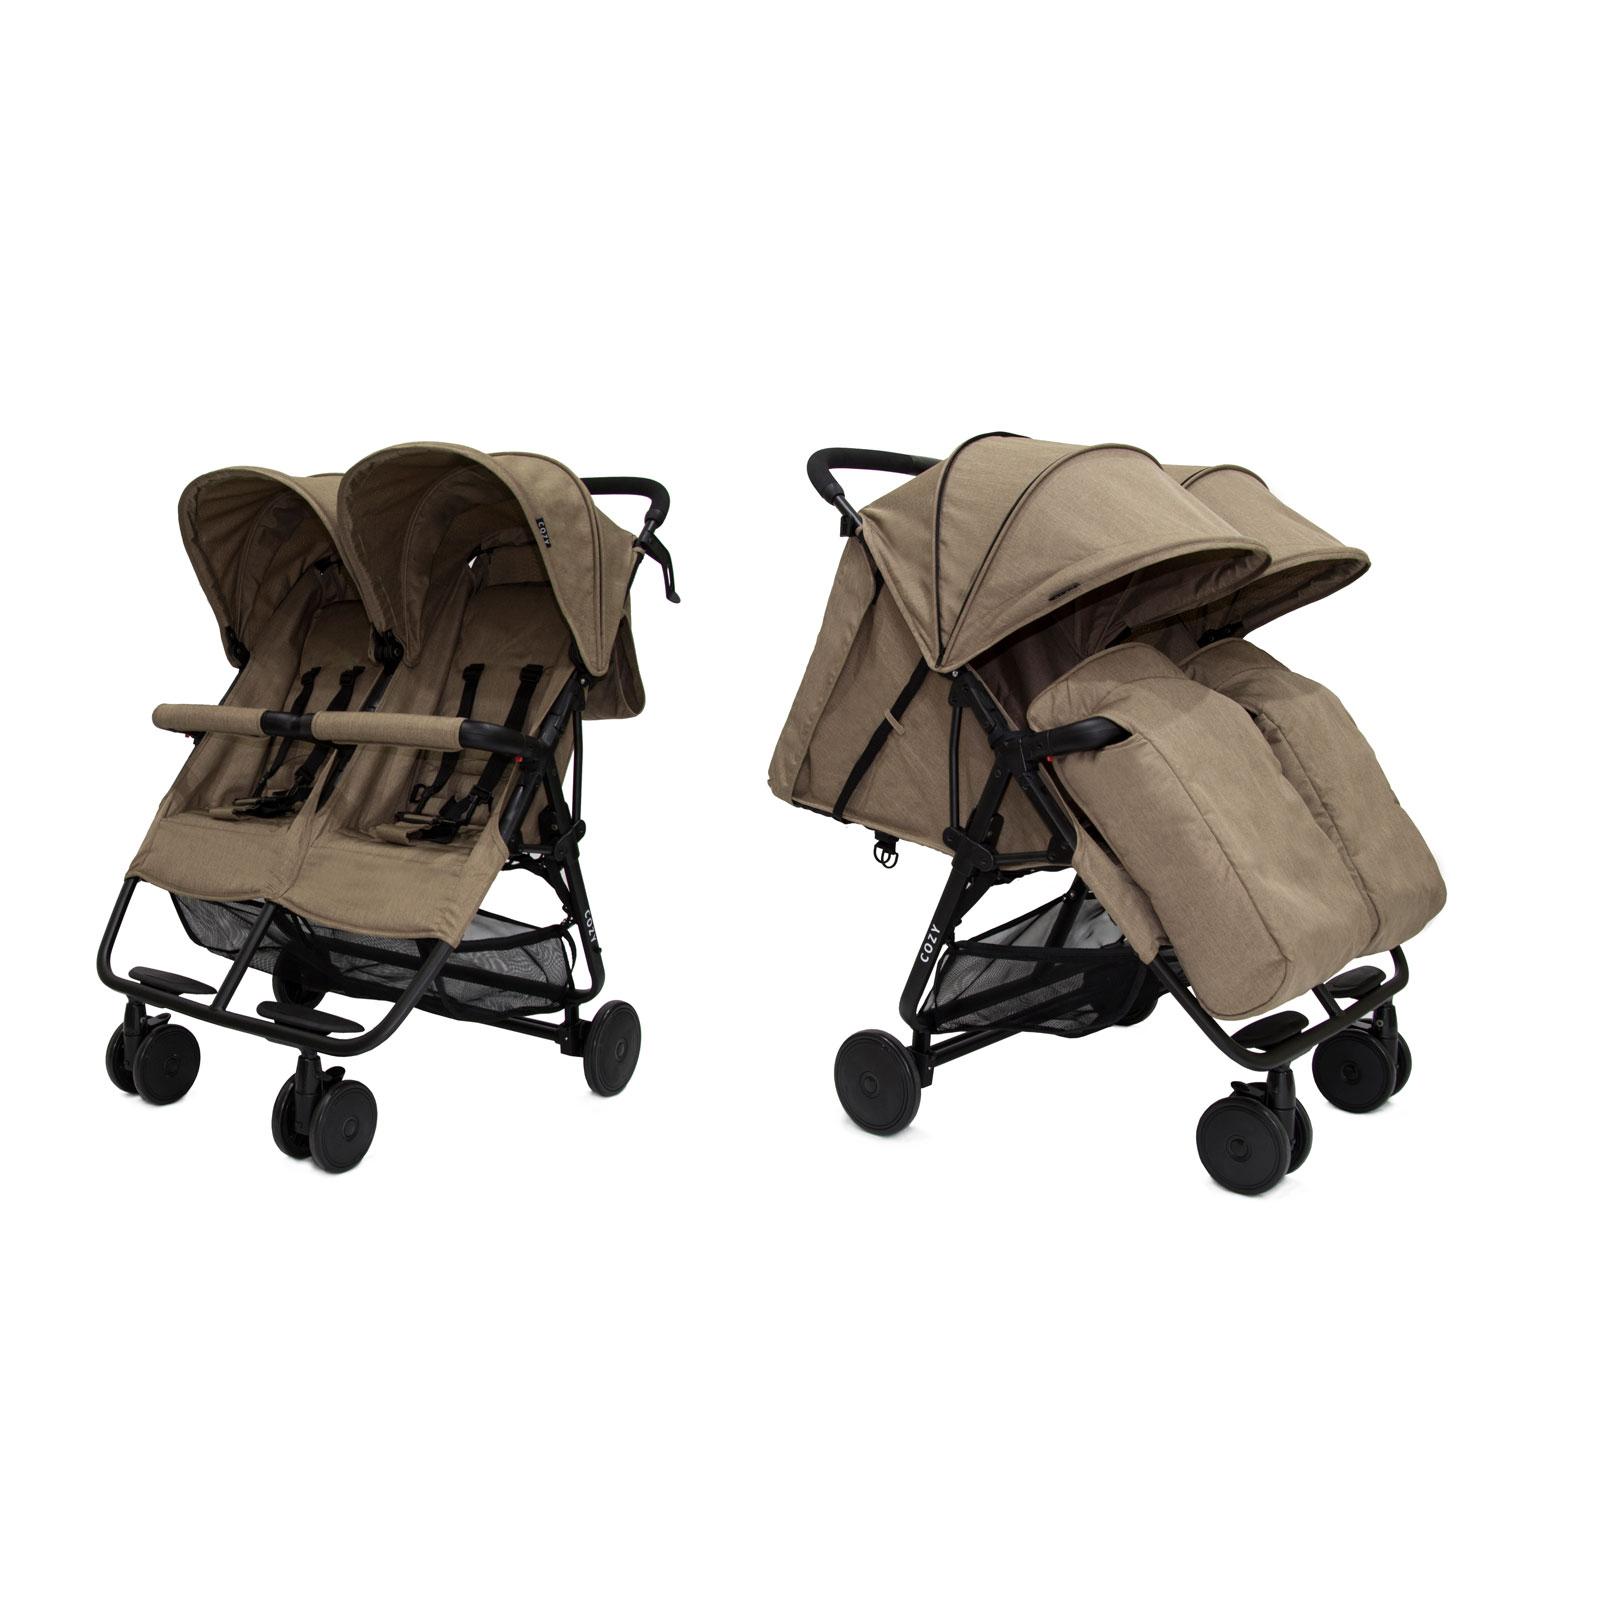 Прогулочная коляска для двойни Cozy Smart Dark Sand Melange<br>